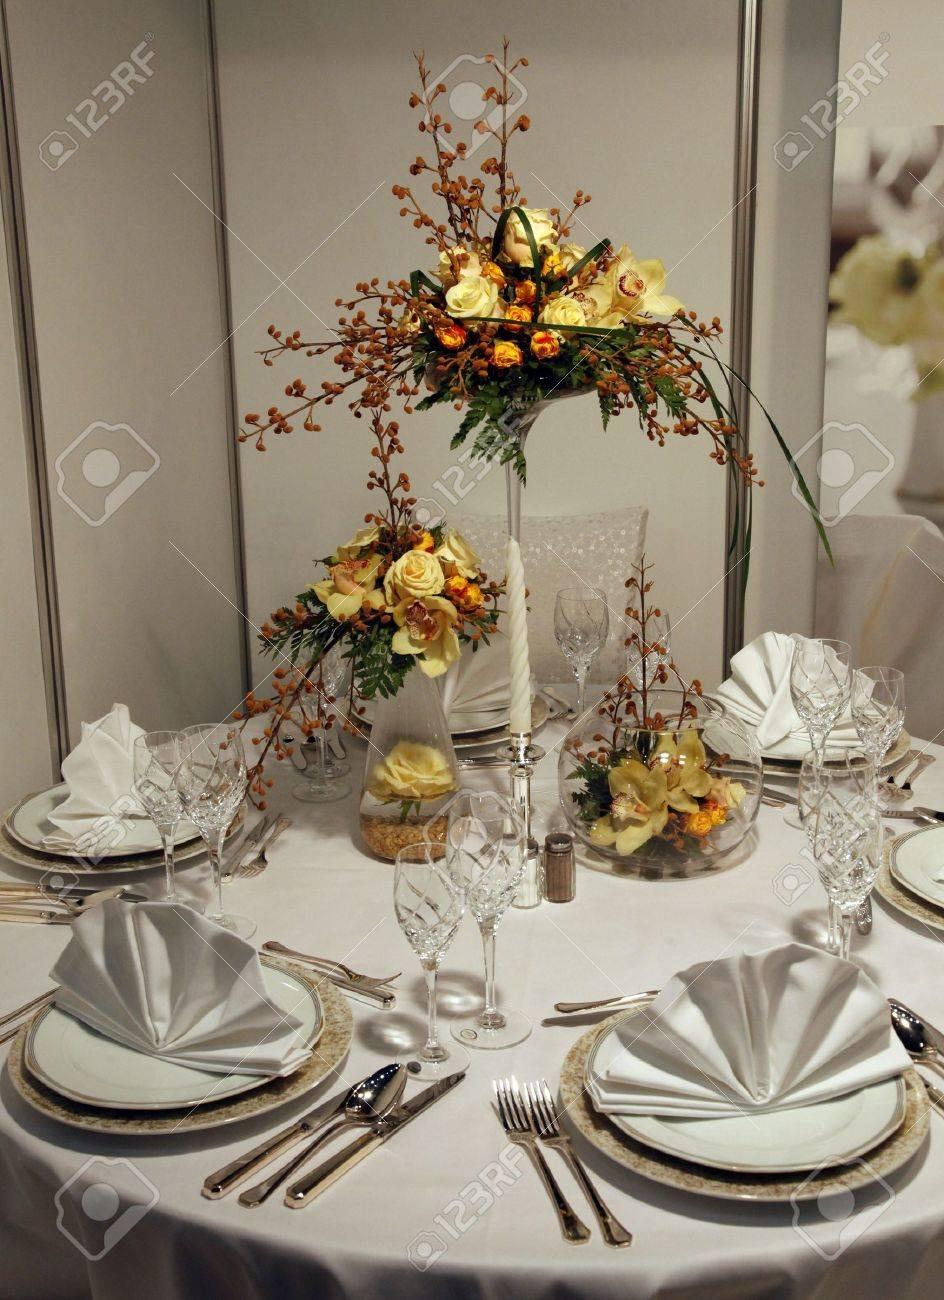 Beautiful table set for wedding Stock Photo - 12424876